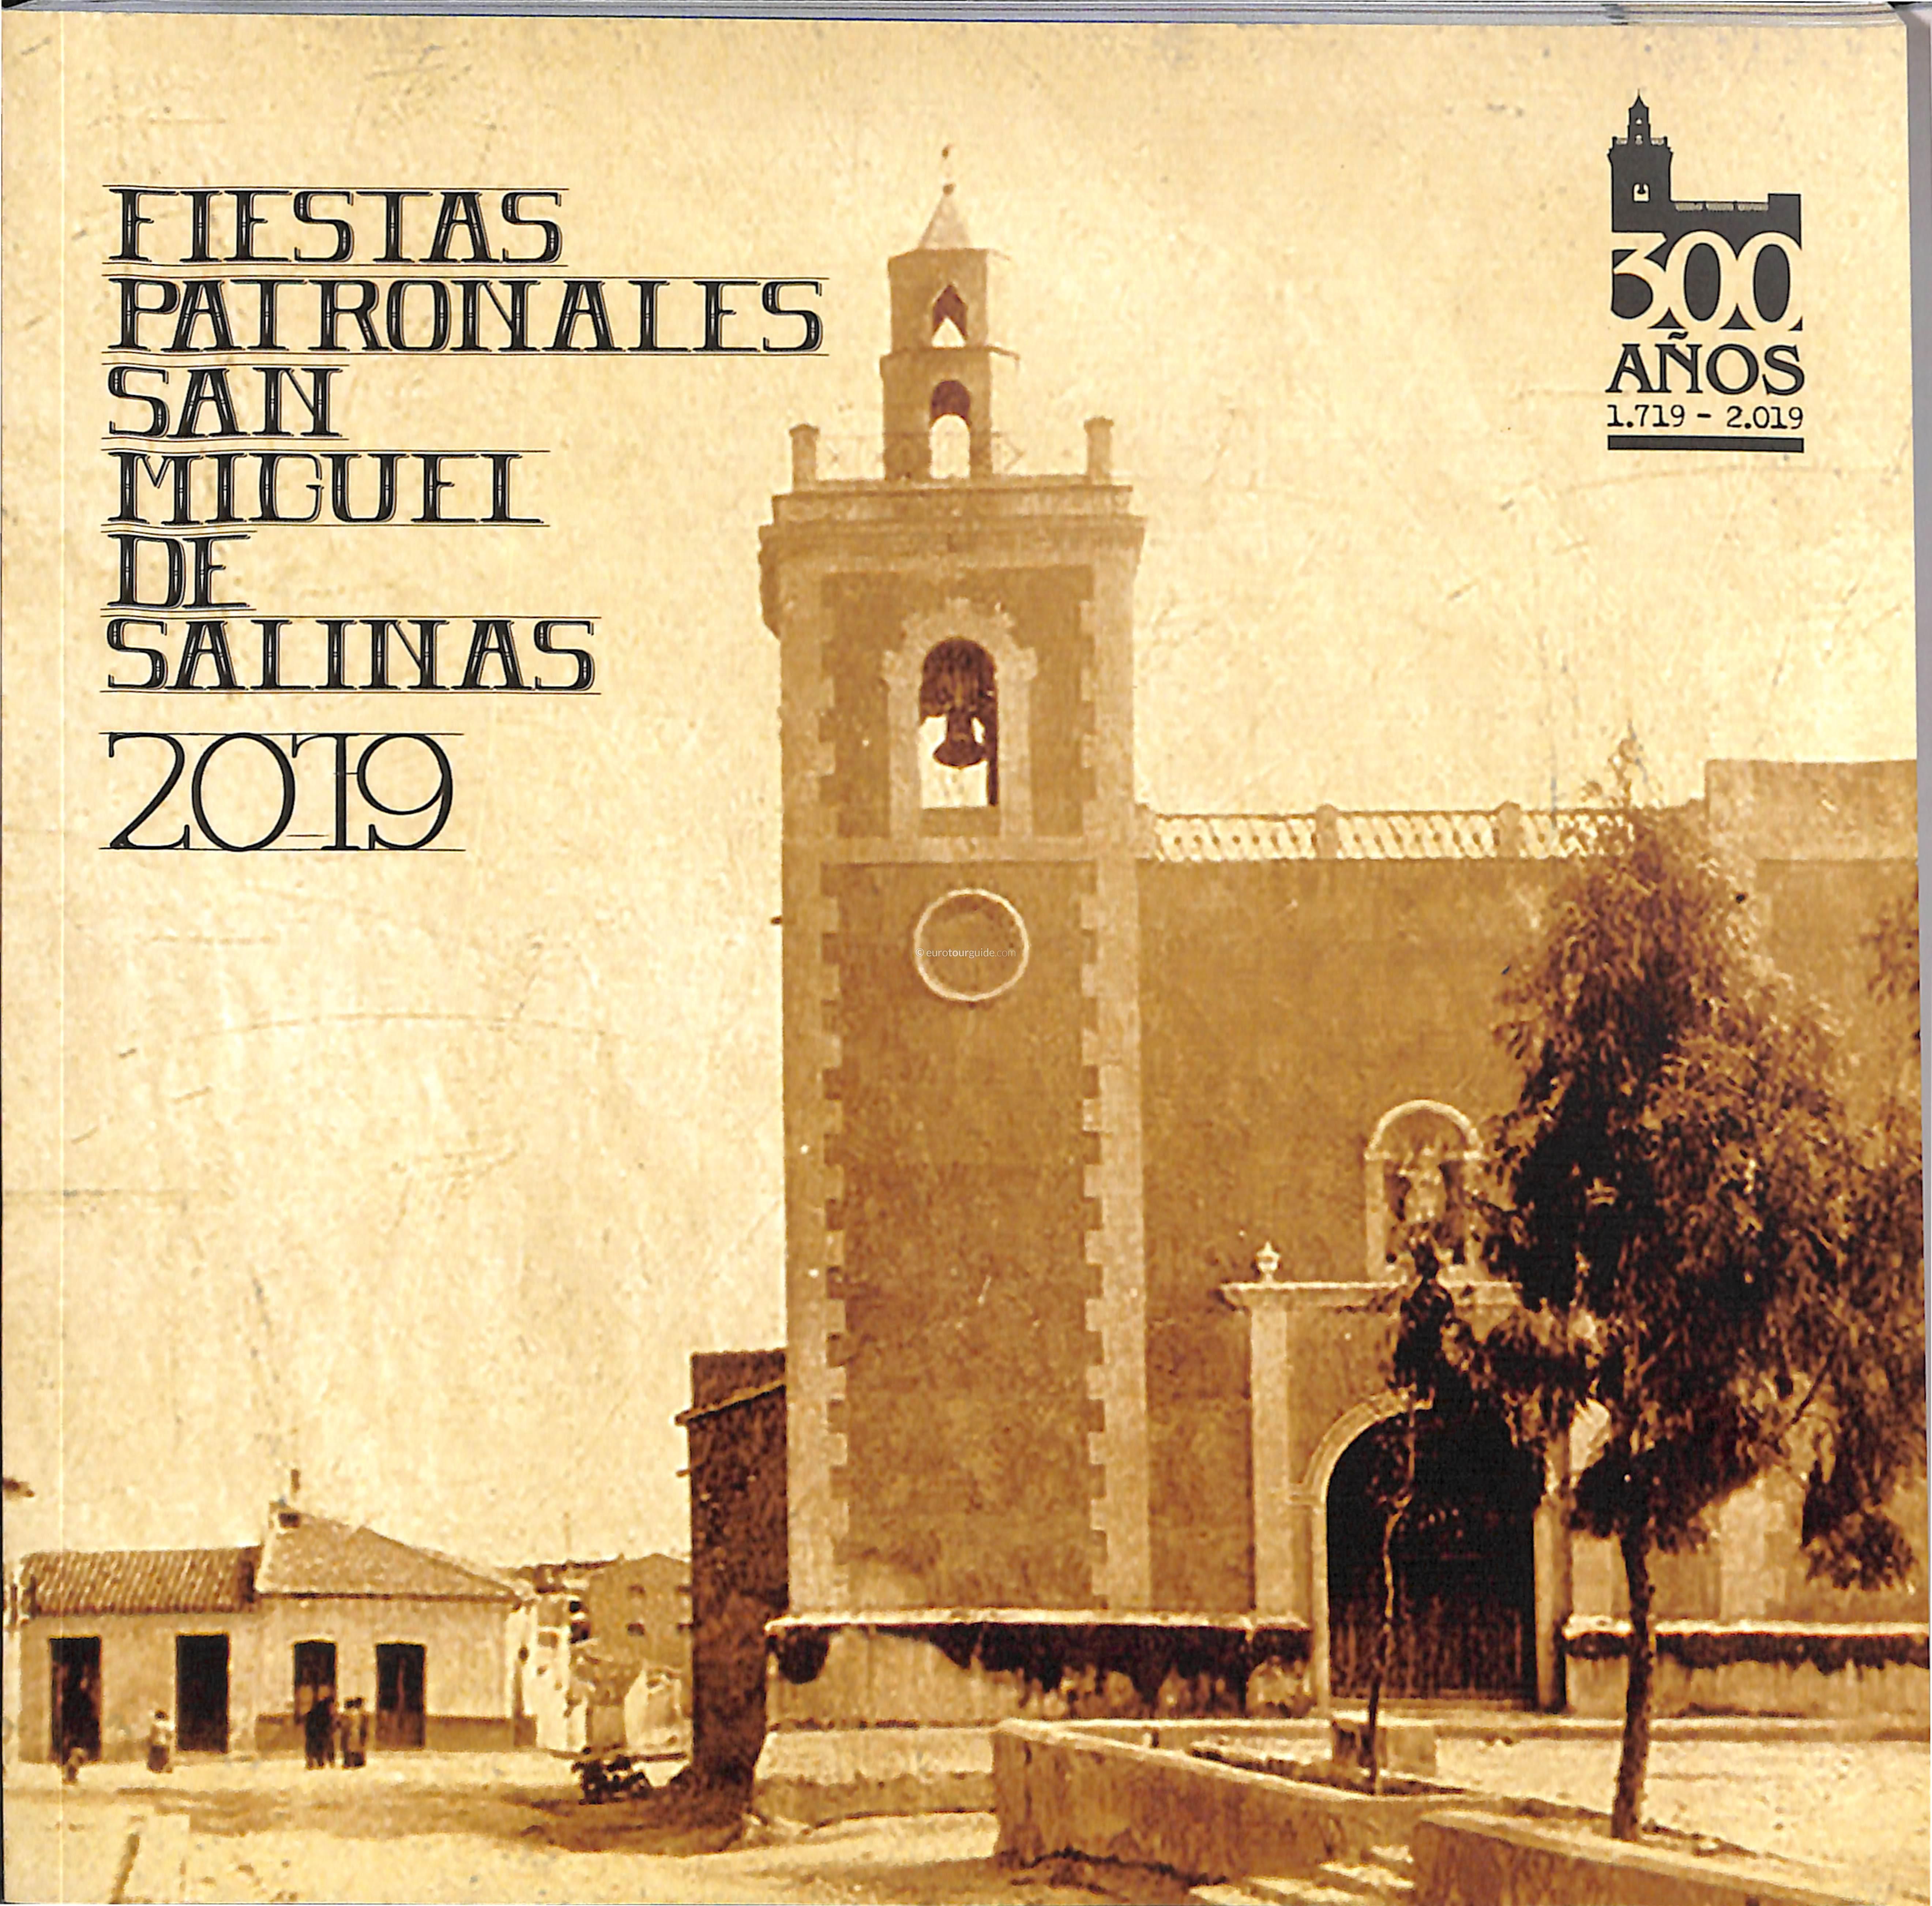 San Miguel de Salinas Fiesta Miguel Arcangel Fiesta 15th September - 6th October 2019